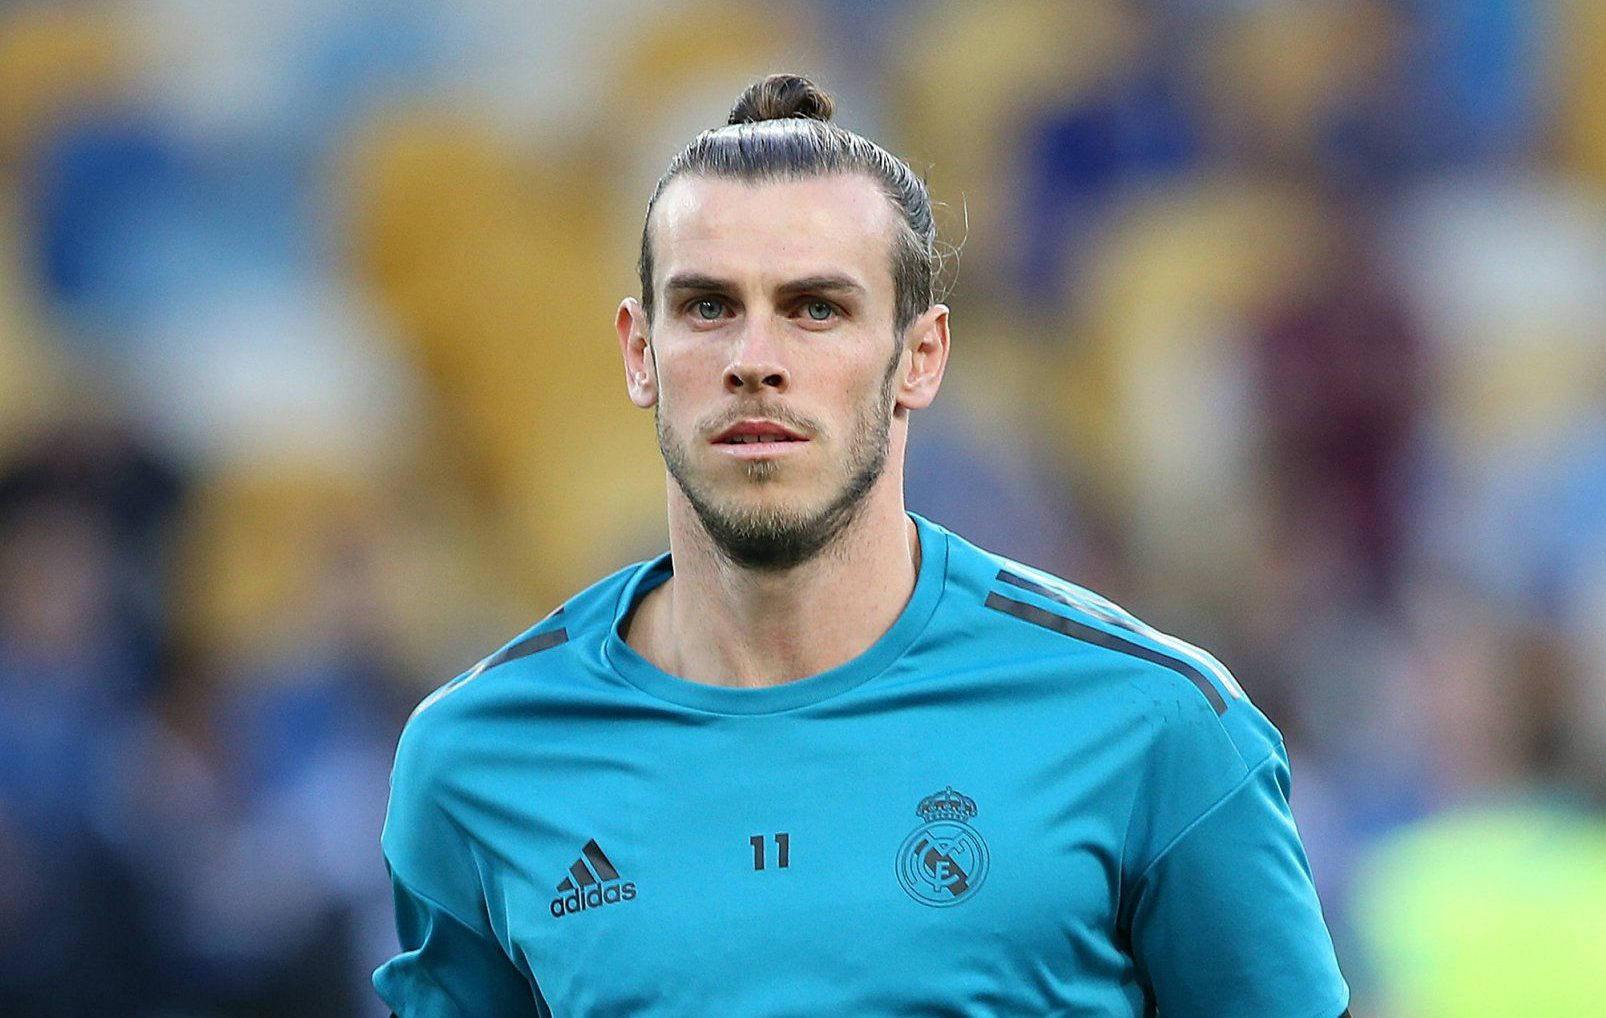 Manchester United boss Jose Mourinho delivers Gareth Bale ultimatum to Ed Woodward